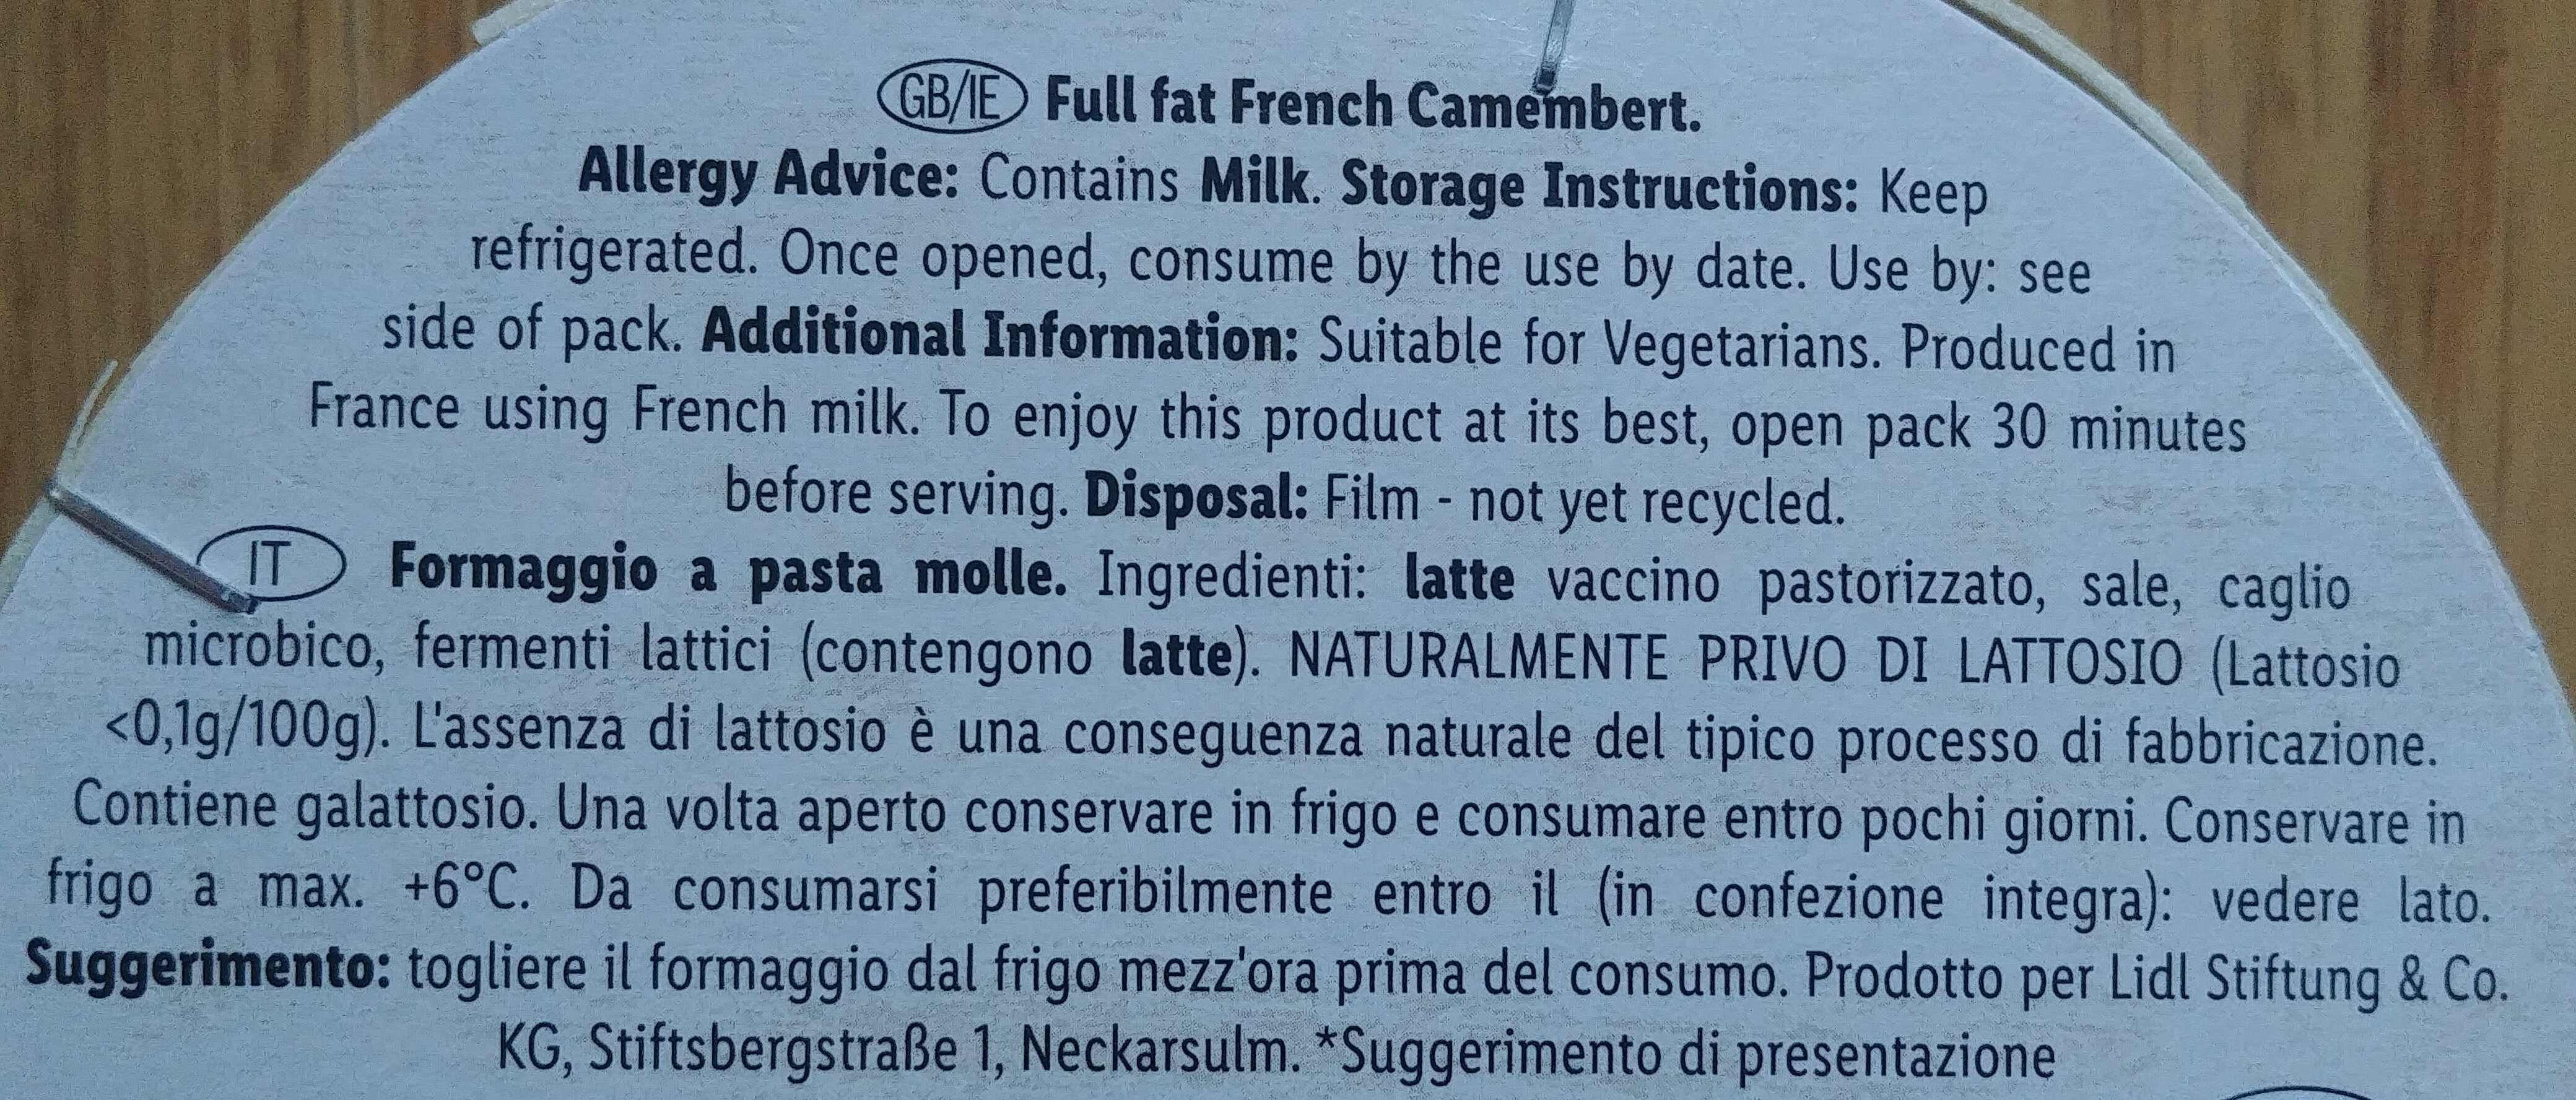 Camembert le Caractère - Ingredients - en